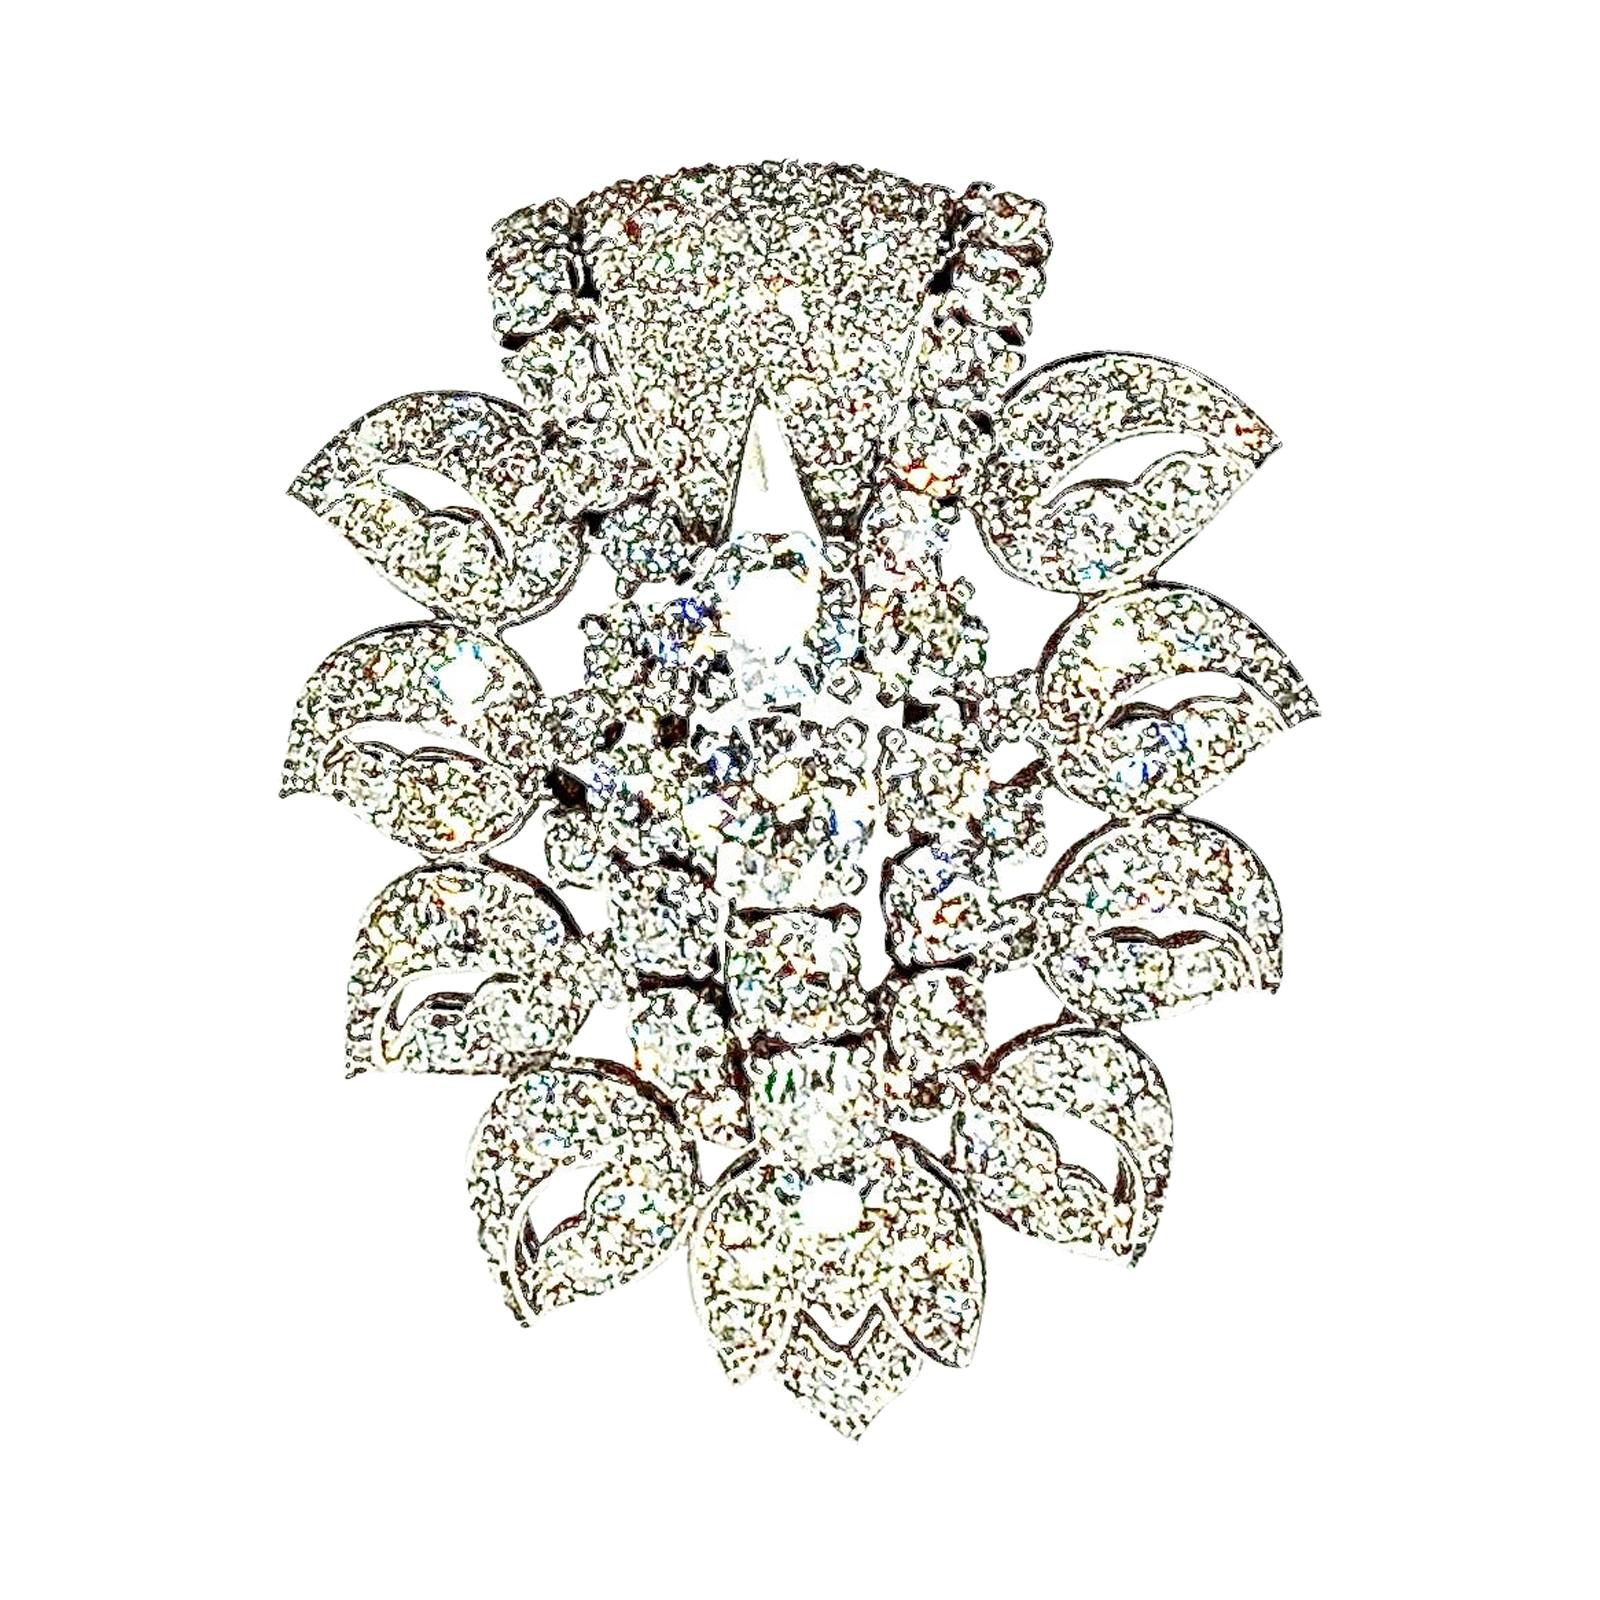 Gemolithos a Cartier Signed Diamond Brooch, circa 1938